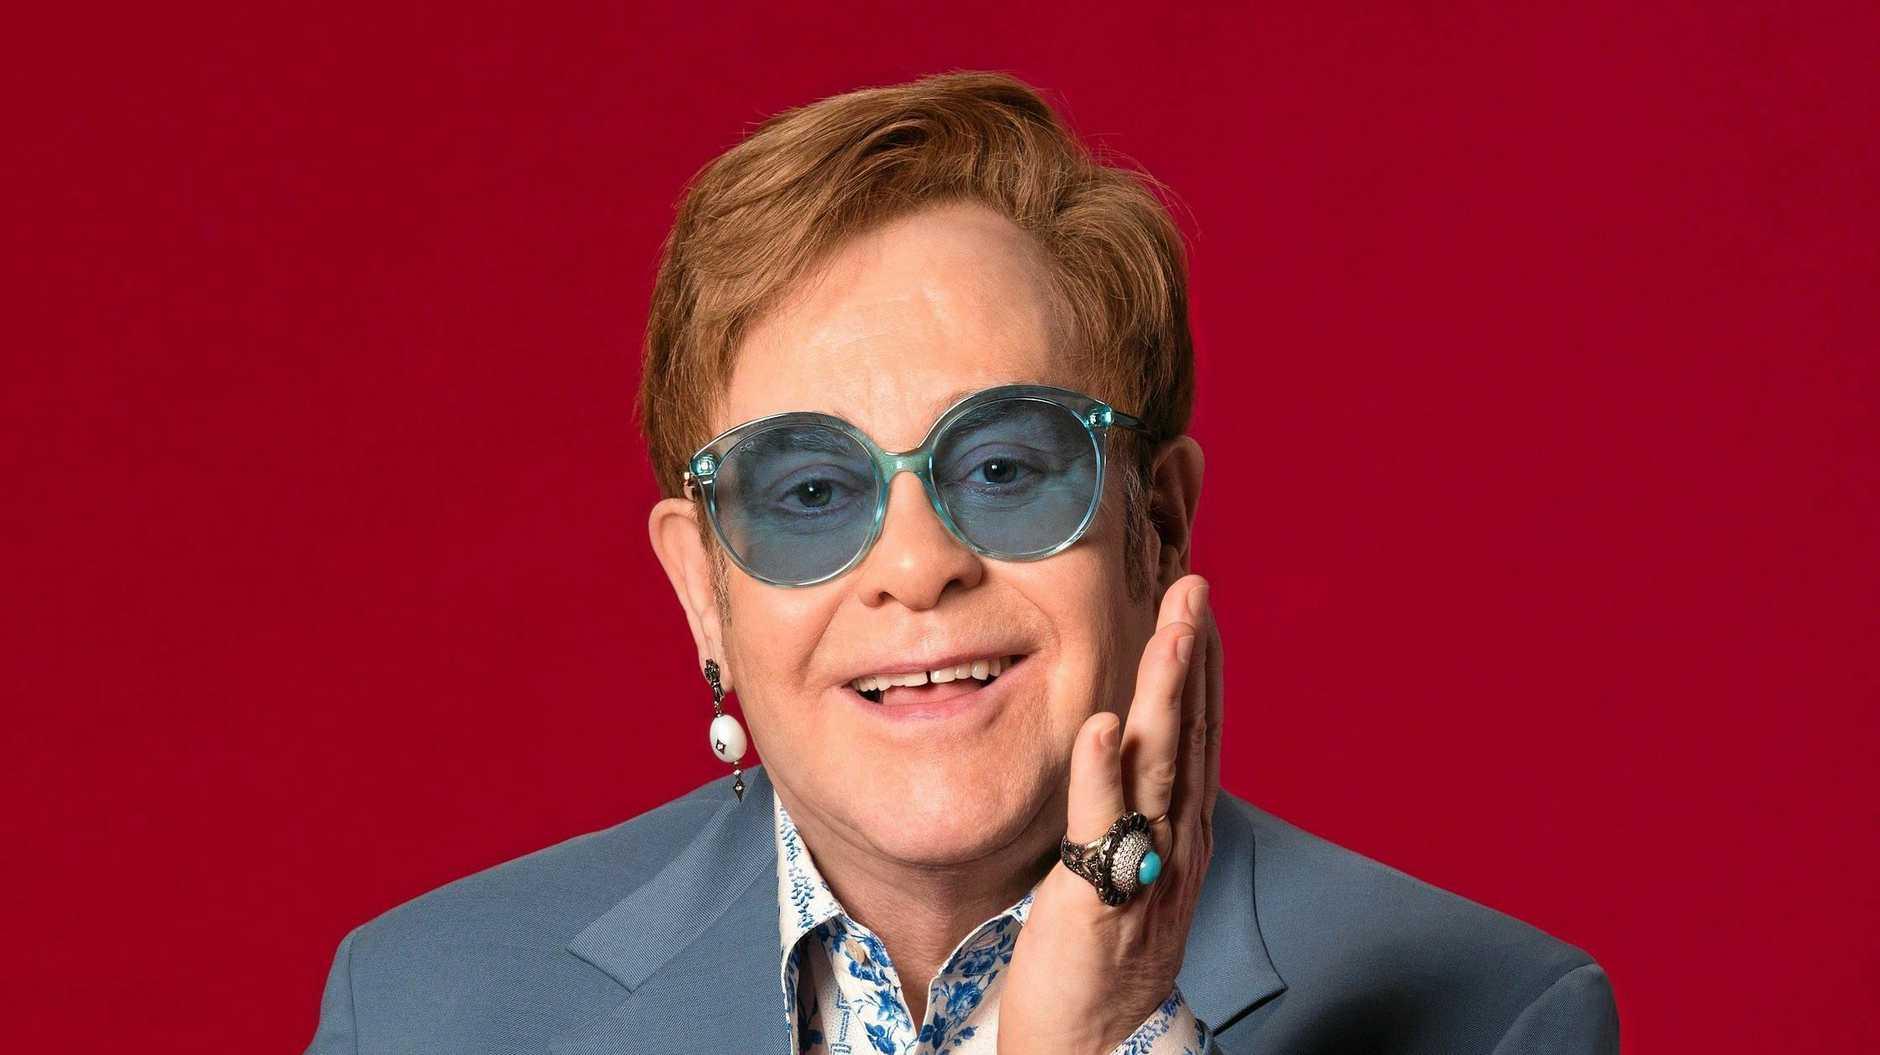 ELTON FEVER: Tickets for Sir Elton John's back-to-back Sunshine Coast shows went on sale on Tuesday.